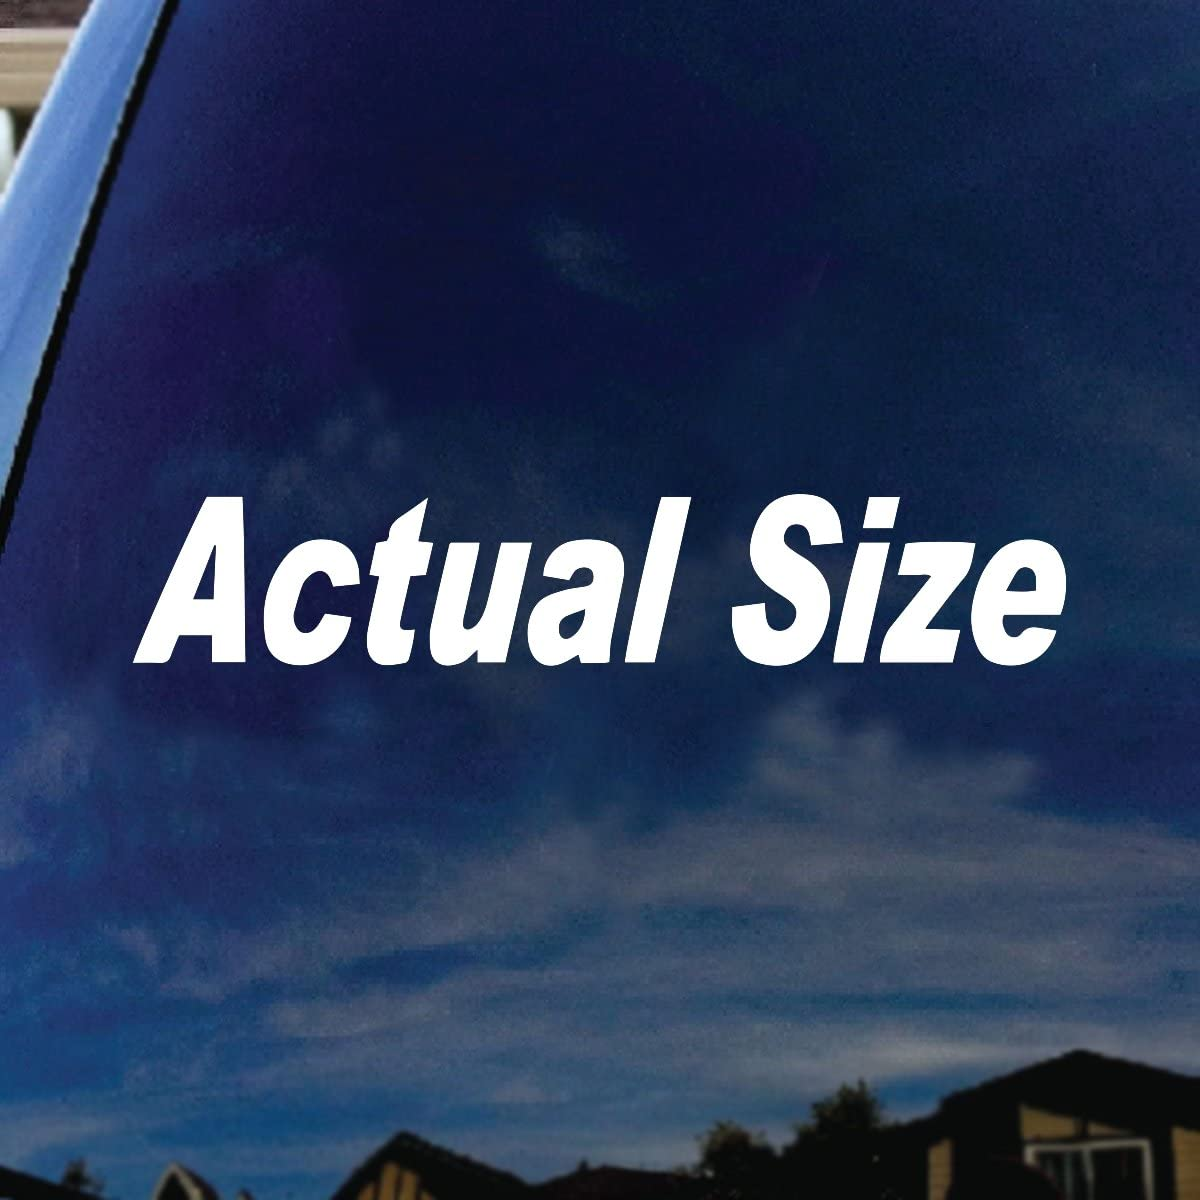 "SoCoolDesign Actual Size Mini Car Truck Laptop Sticker Decal 5"" Wide (White)"